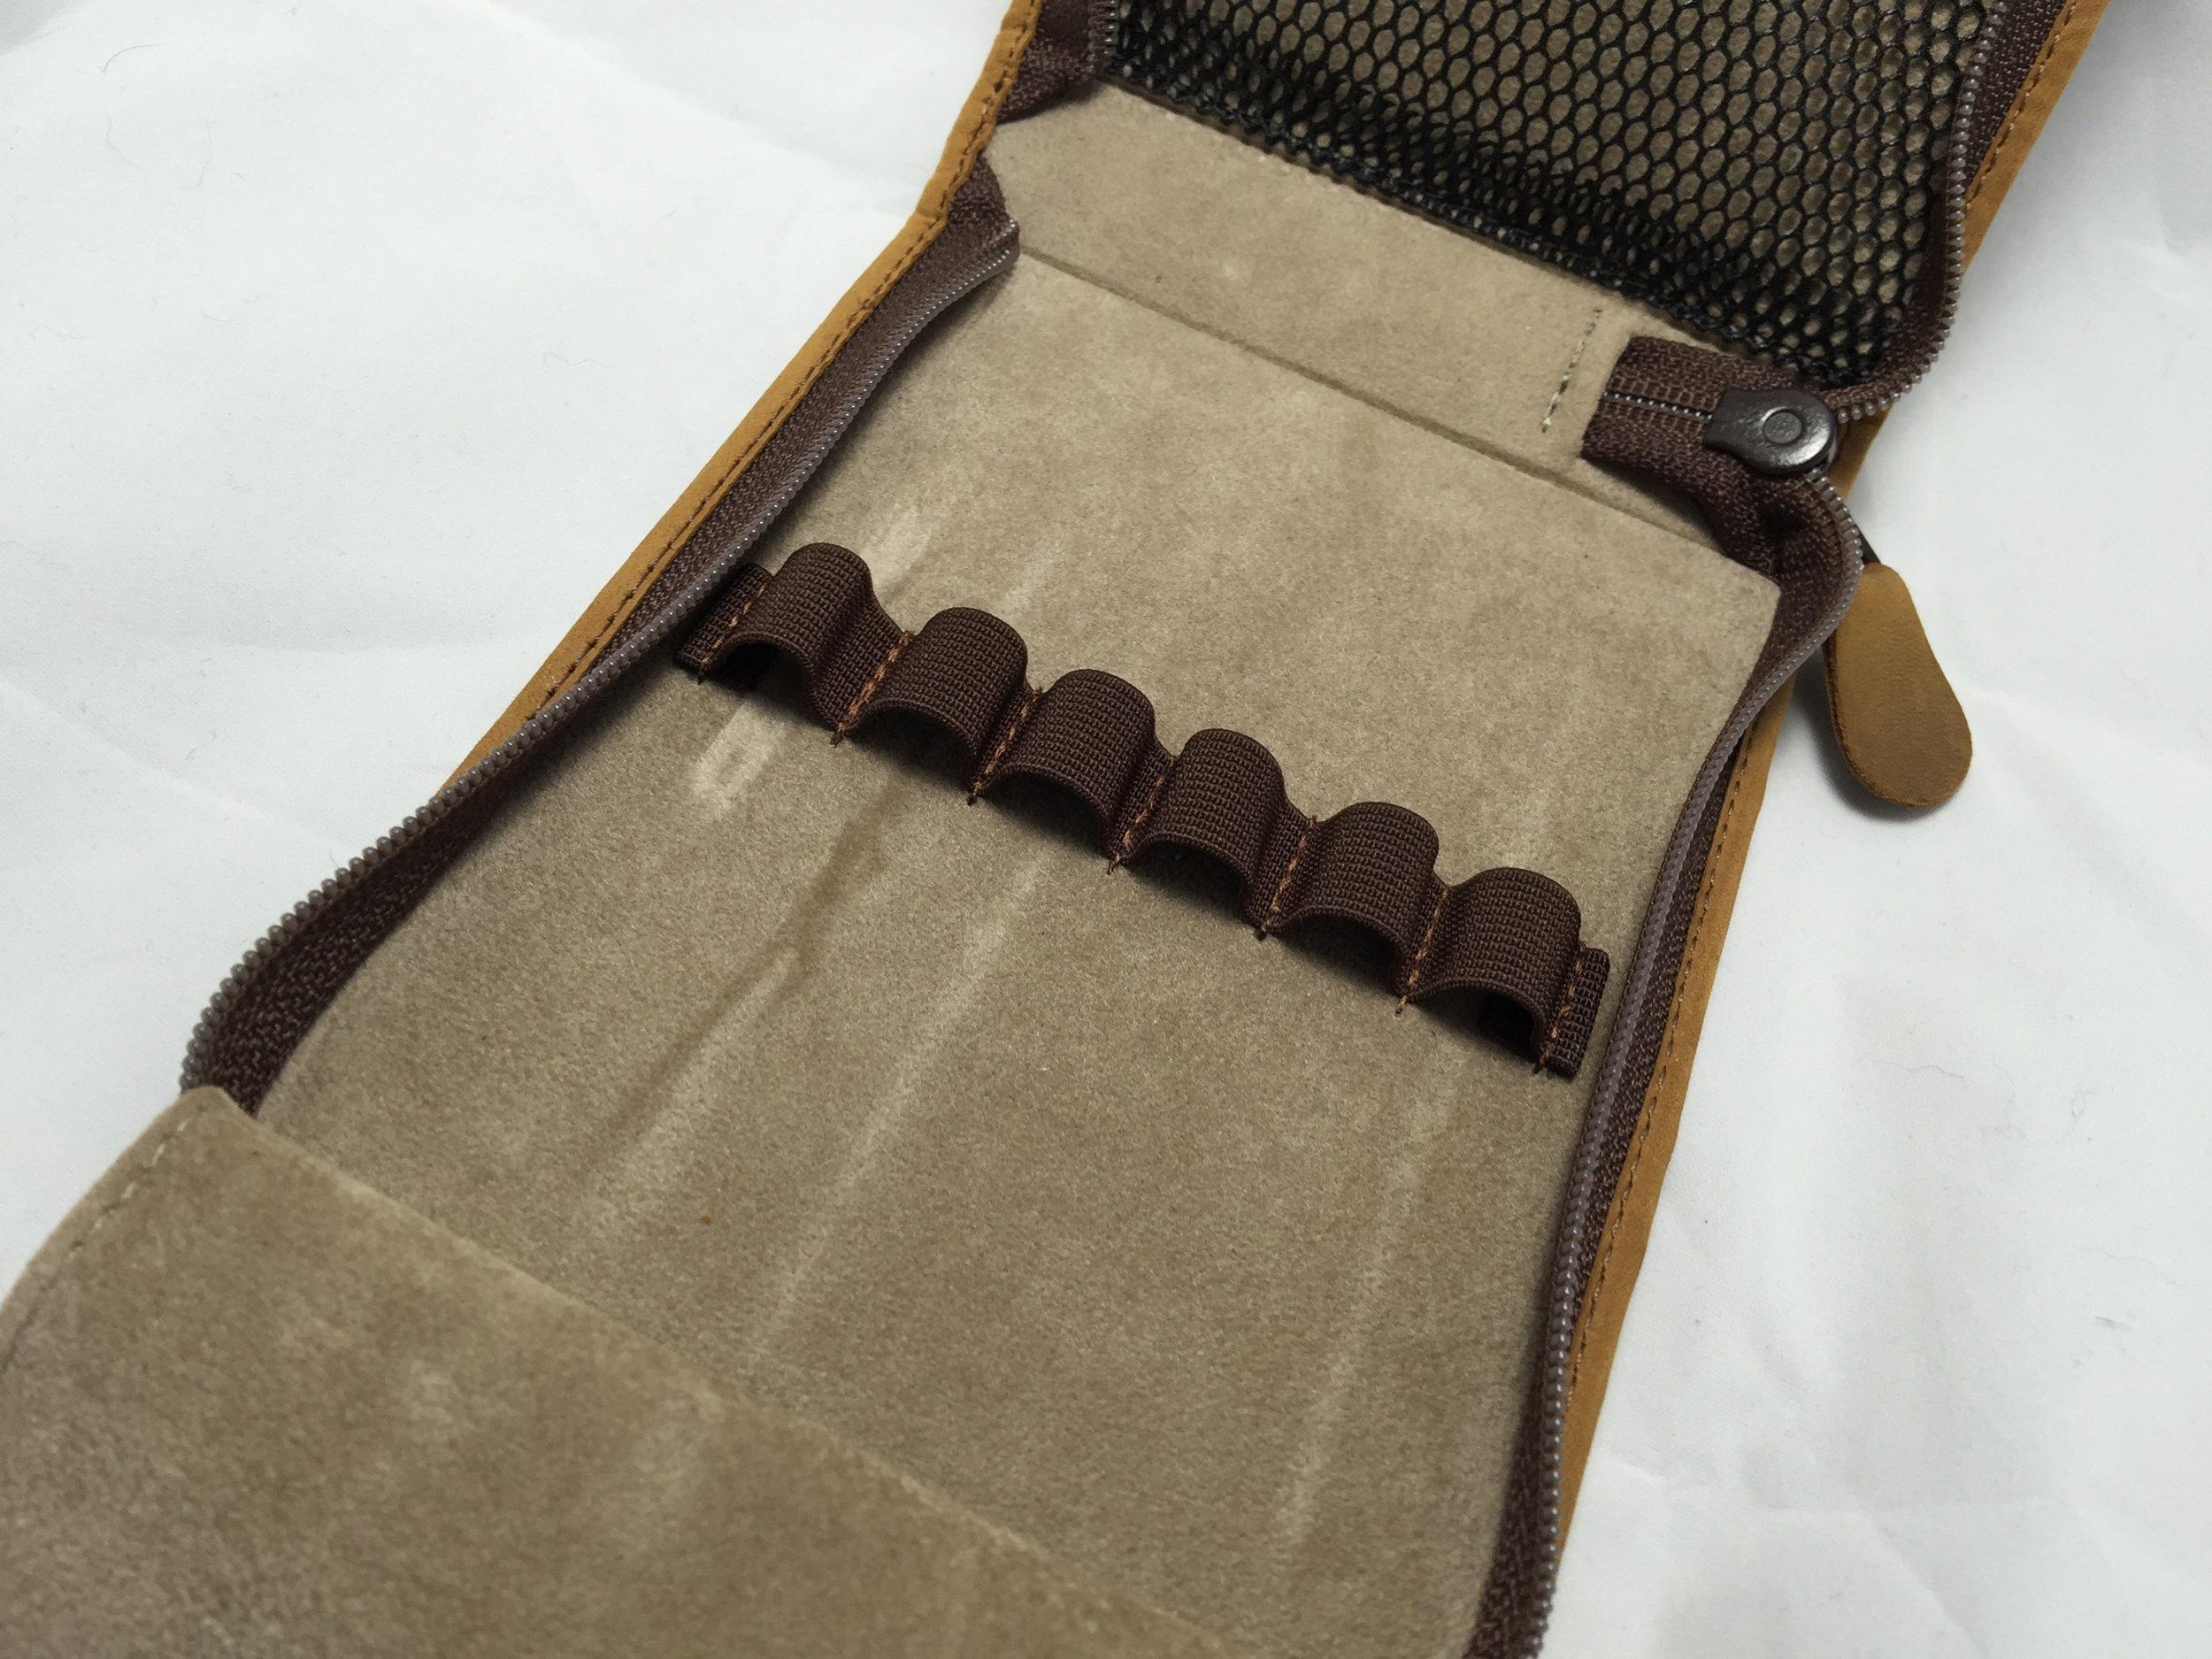 kaweco-leather-case-empty